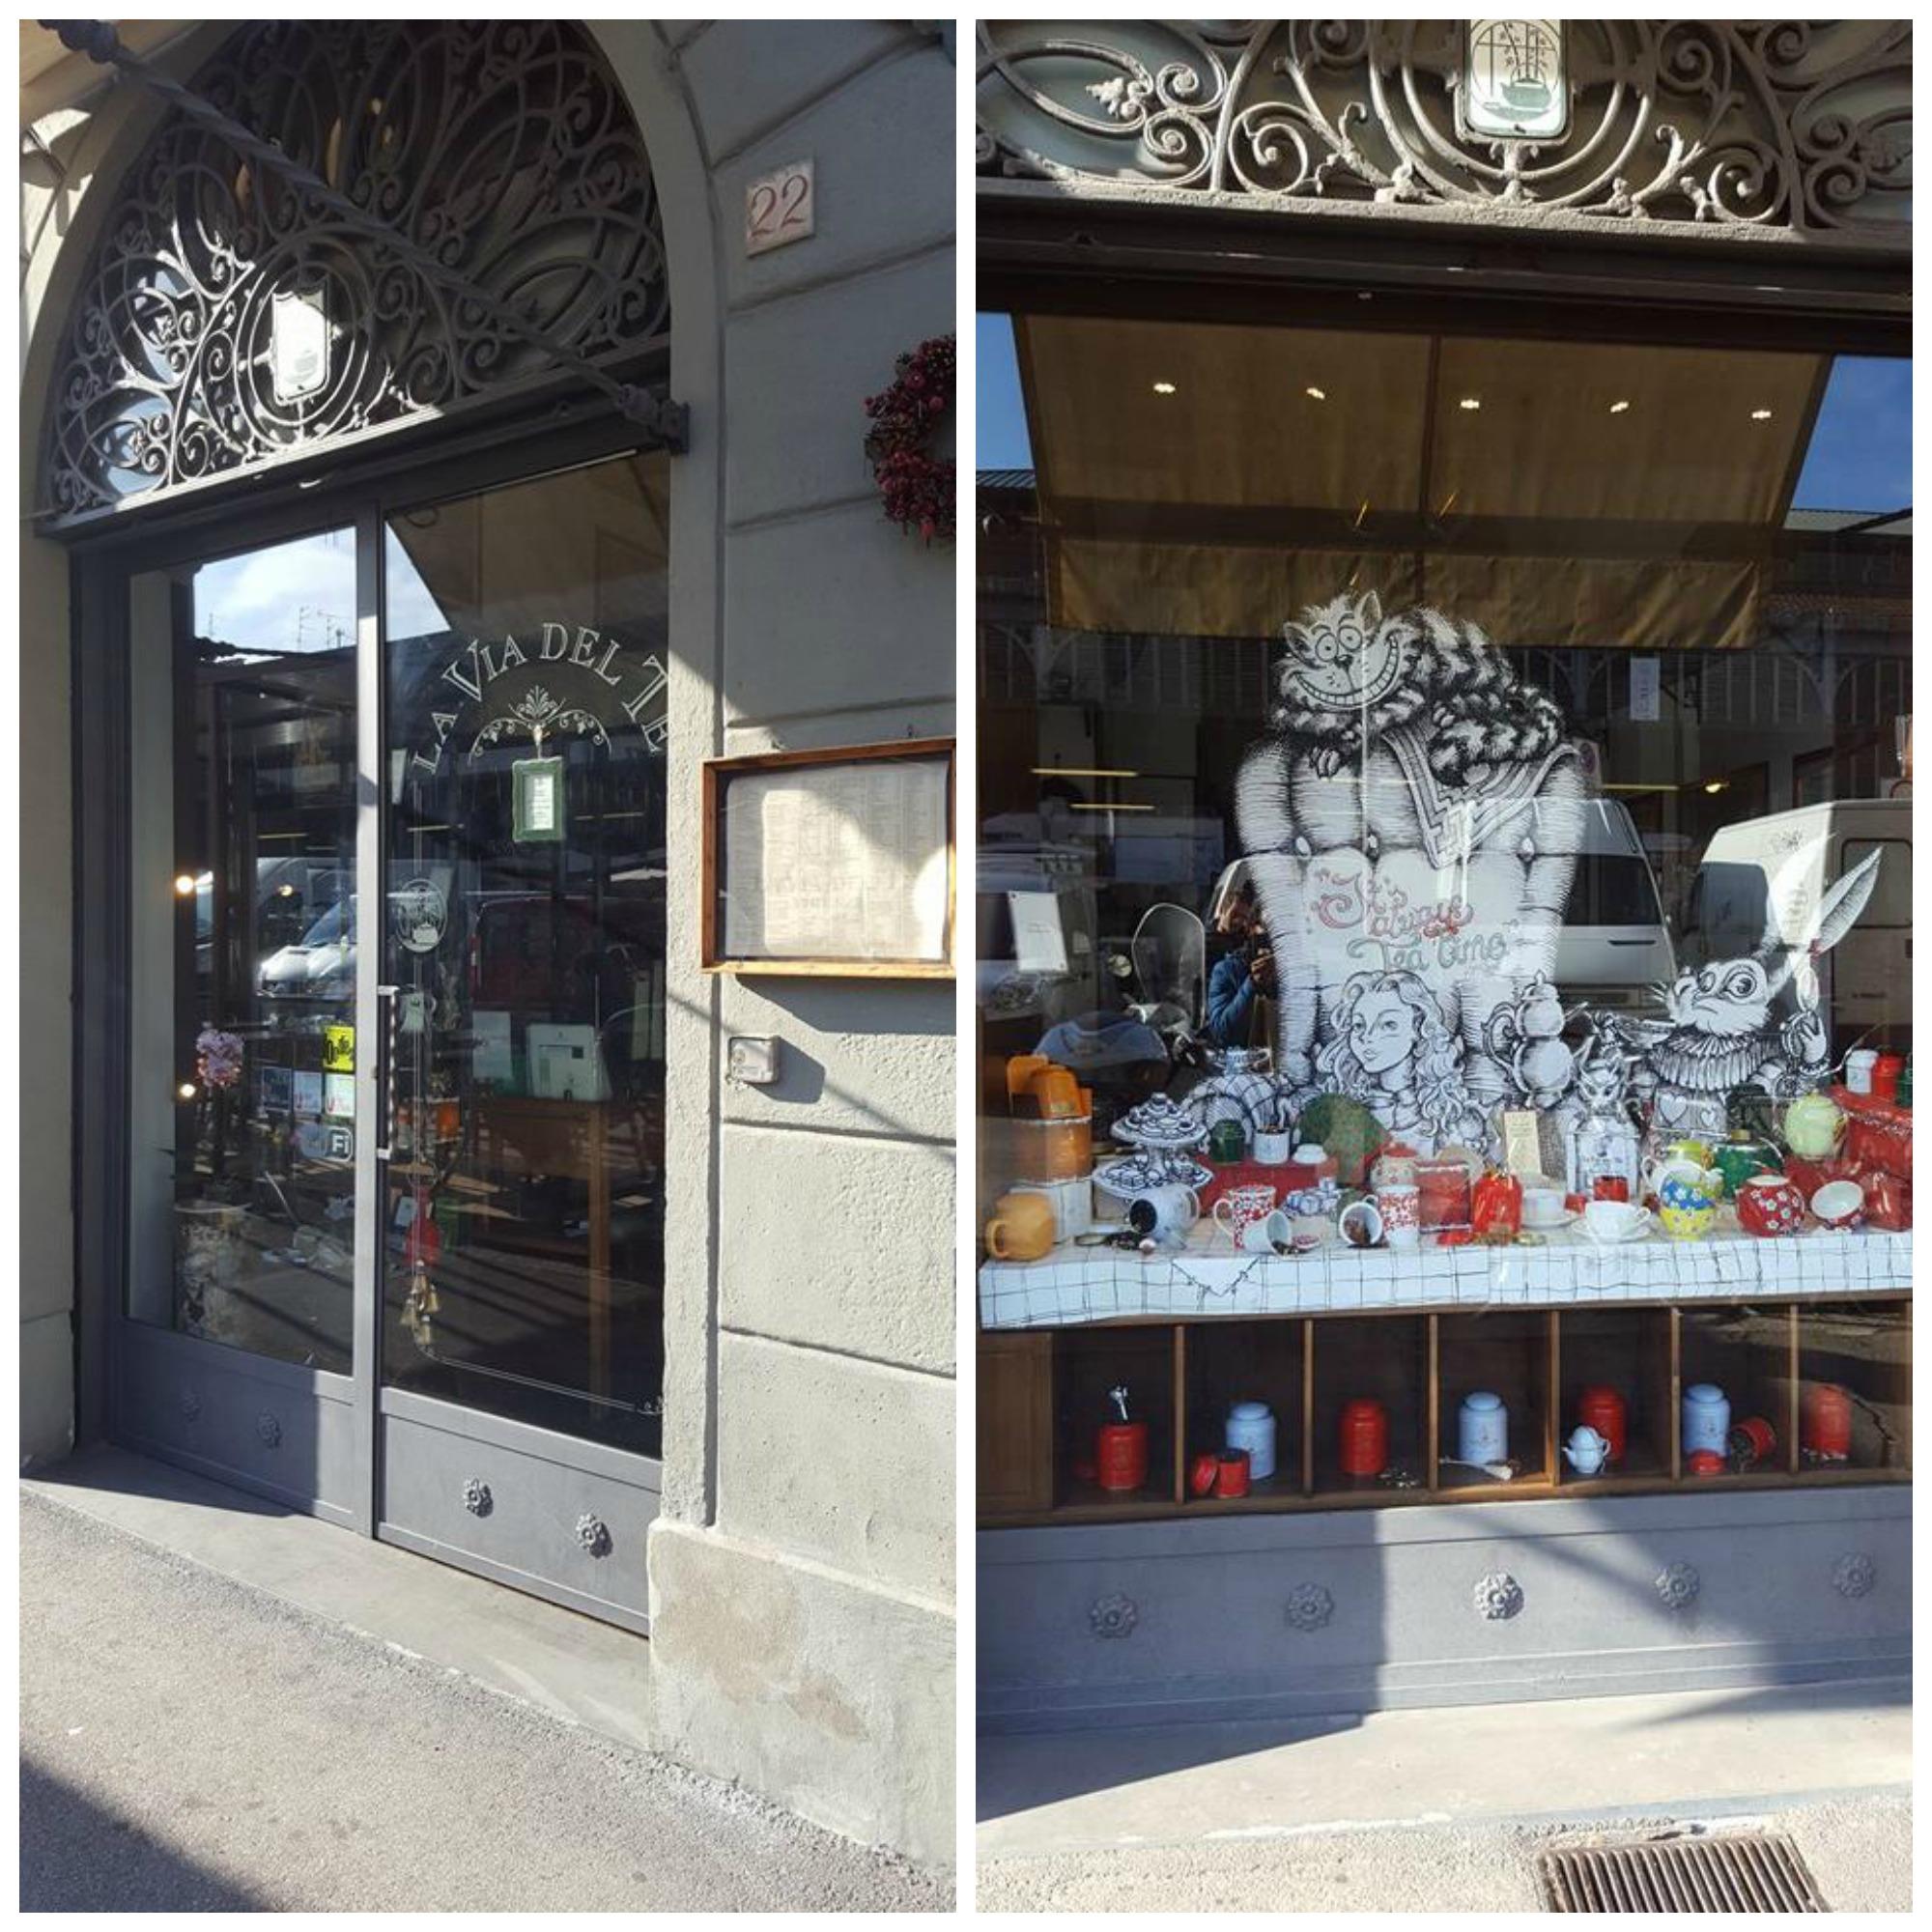 GustiAMO FIRENZE: Dove mangiare a Firenze La Via del tè - Firenze